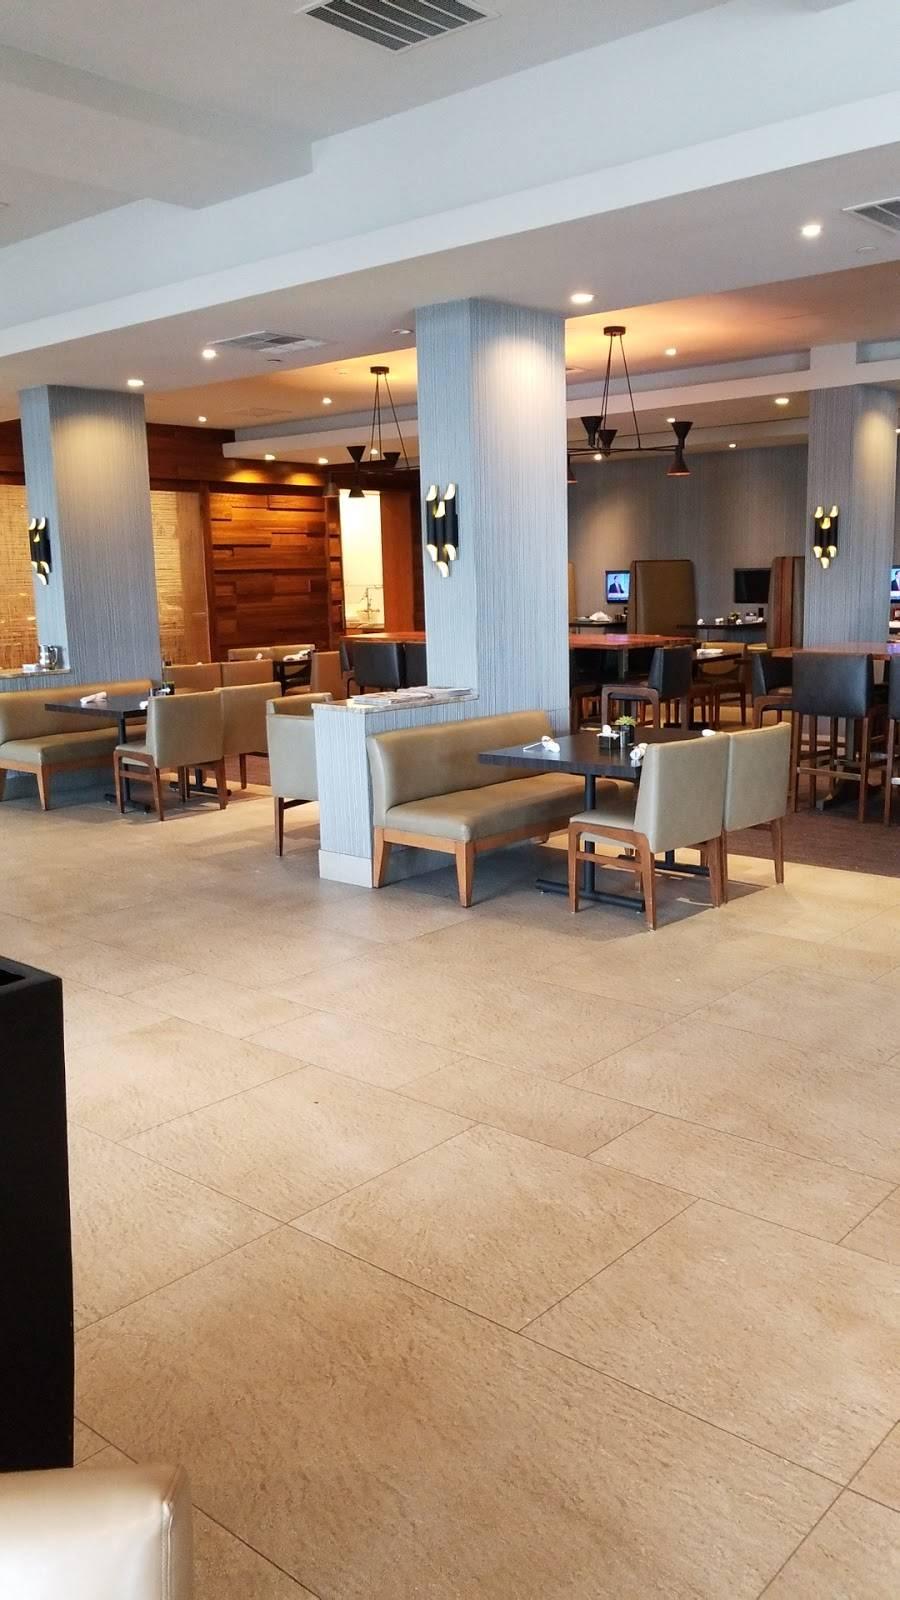 Polanco Kitchen & Bar | restaurant | 901 Camino del Rio S, San Diego, CA 92108, USA | 6197675555 OR +1 619-767-5555